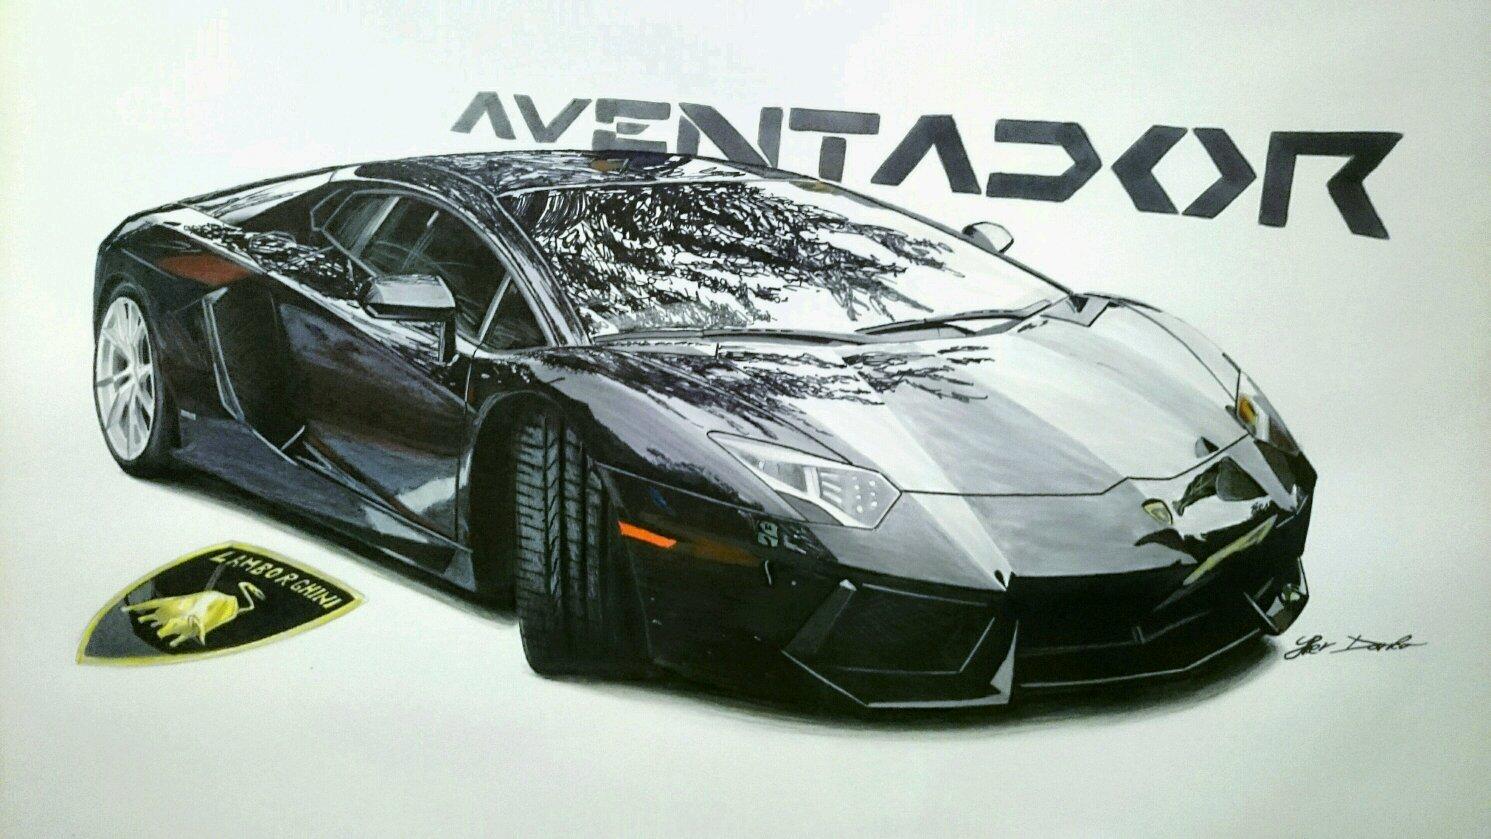 Lamborghini Aventador, 50x35cm, 7 hours of work, fb page: Car ...